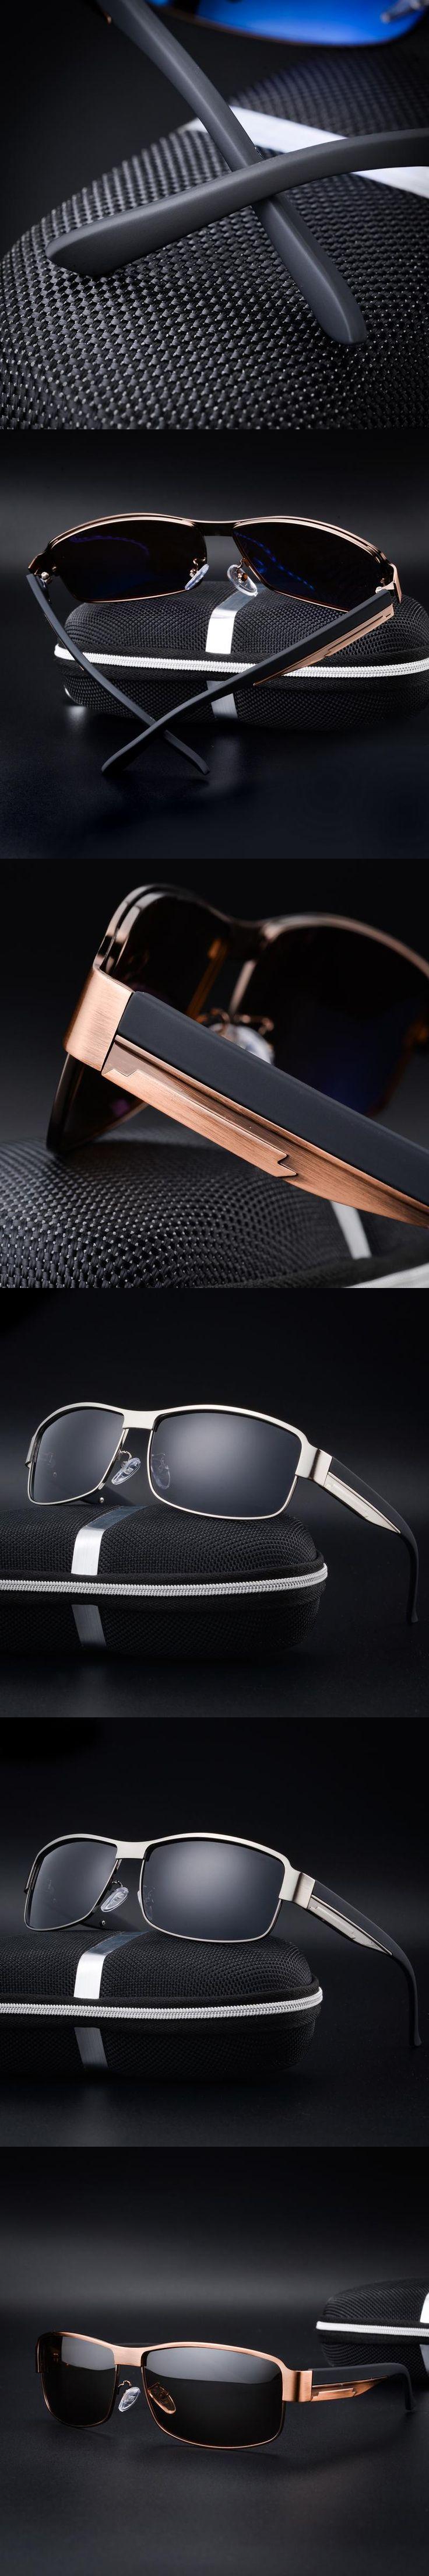 Fashion 2017 Men Sunglasses Plastic Polarized Mirror Glasses For Men Adult Rectangle Metal Alloy Frame Oculos De Sol Masculino